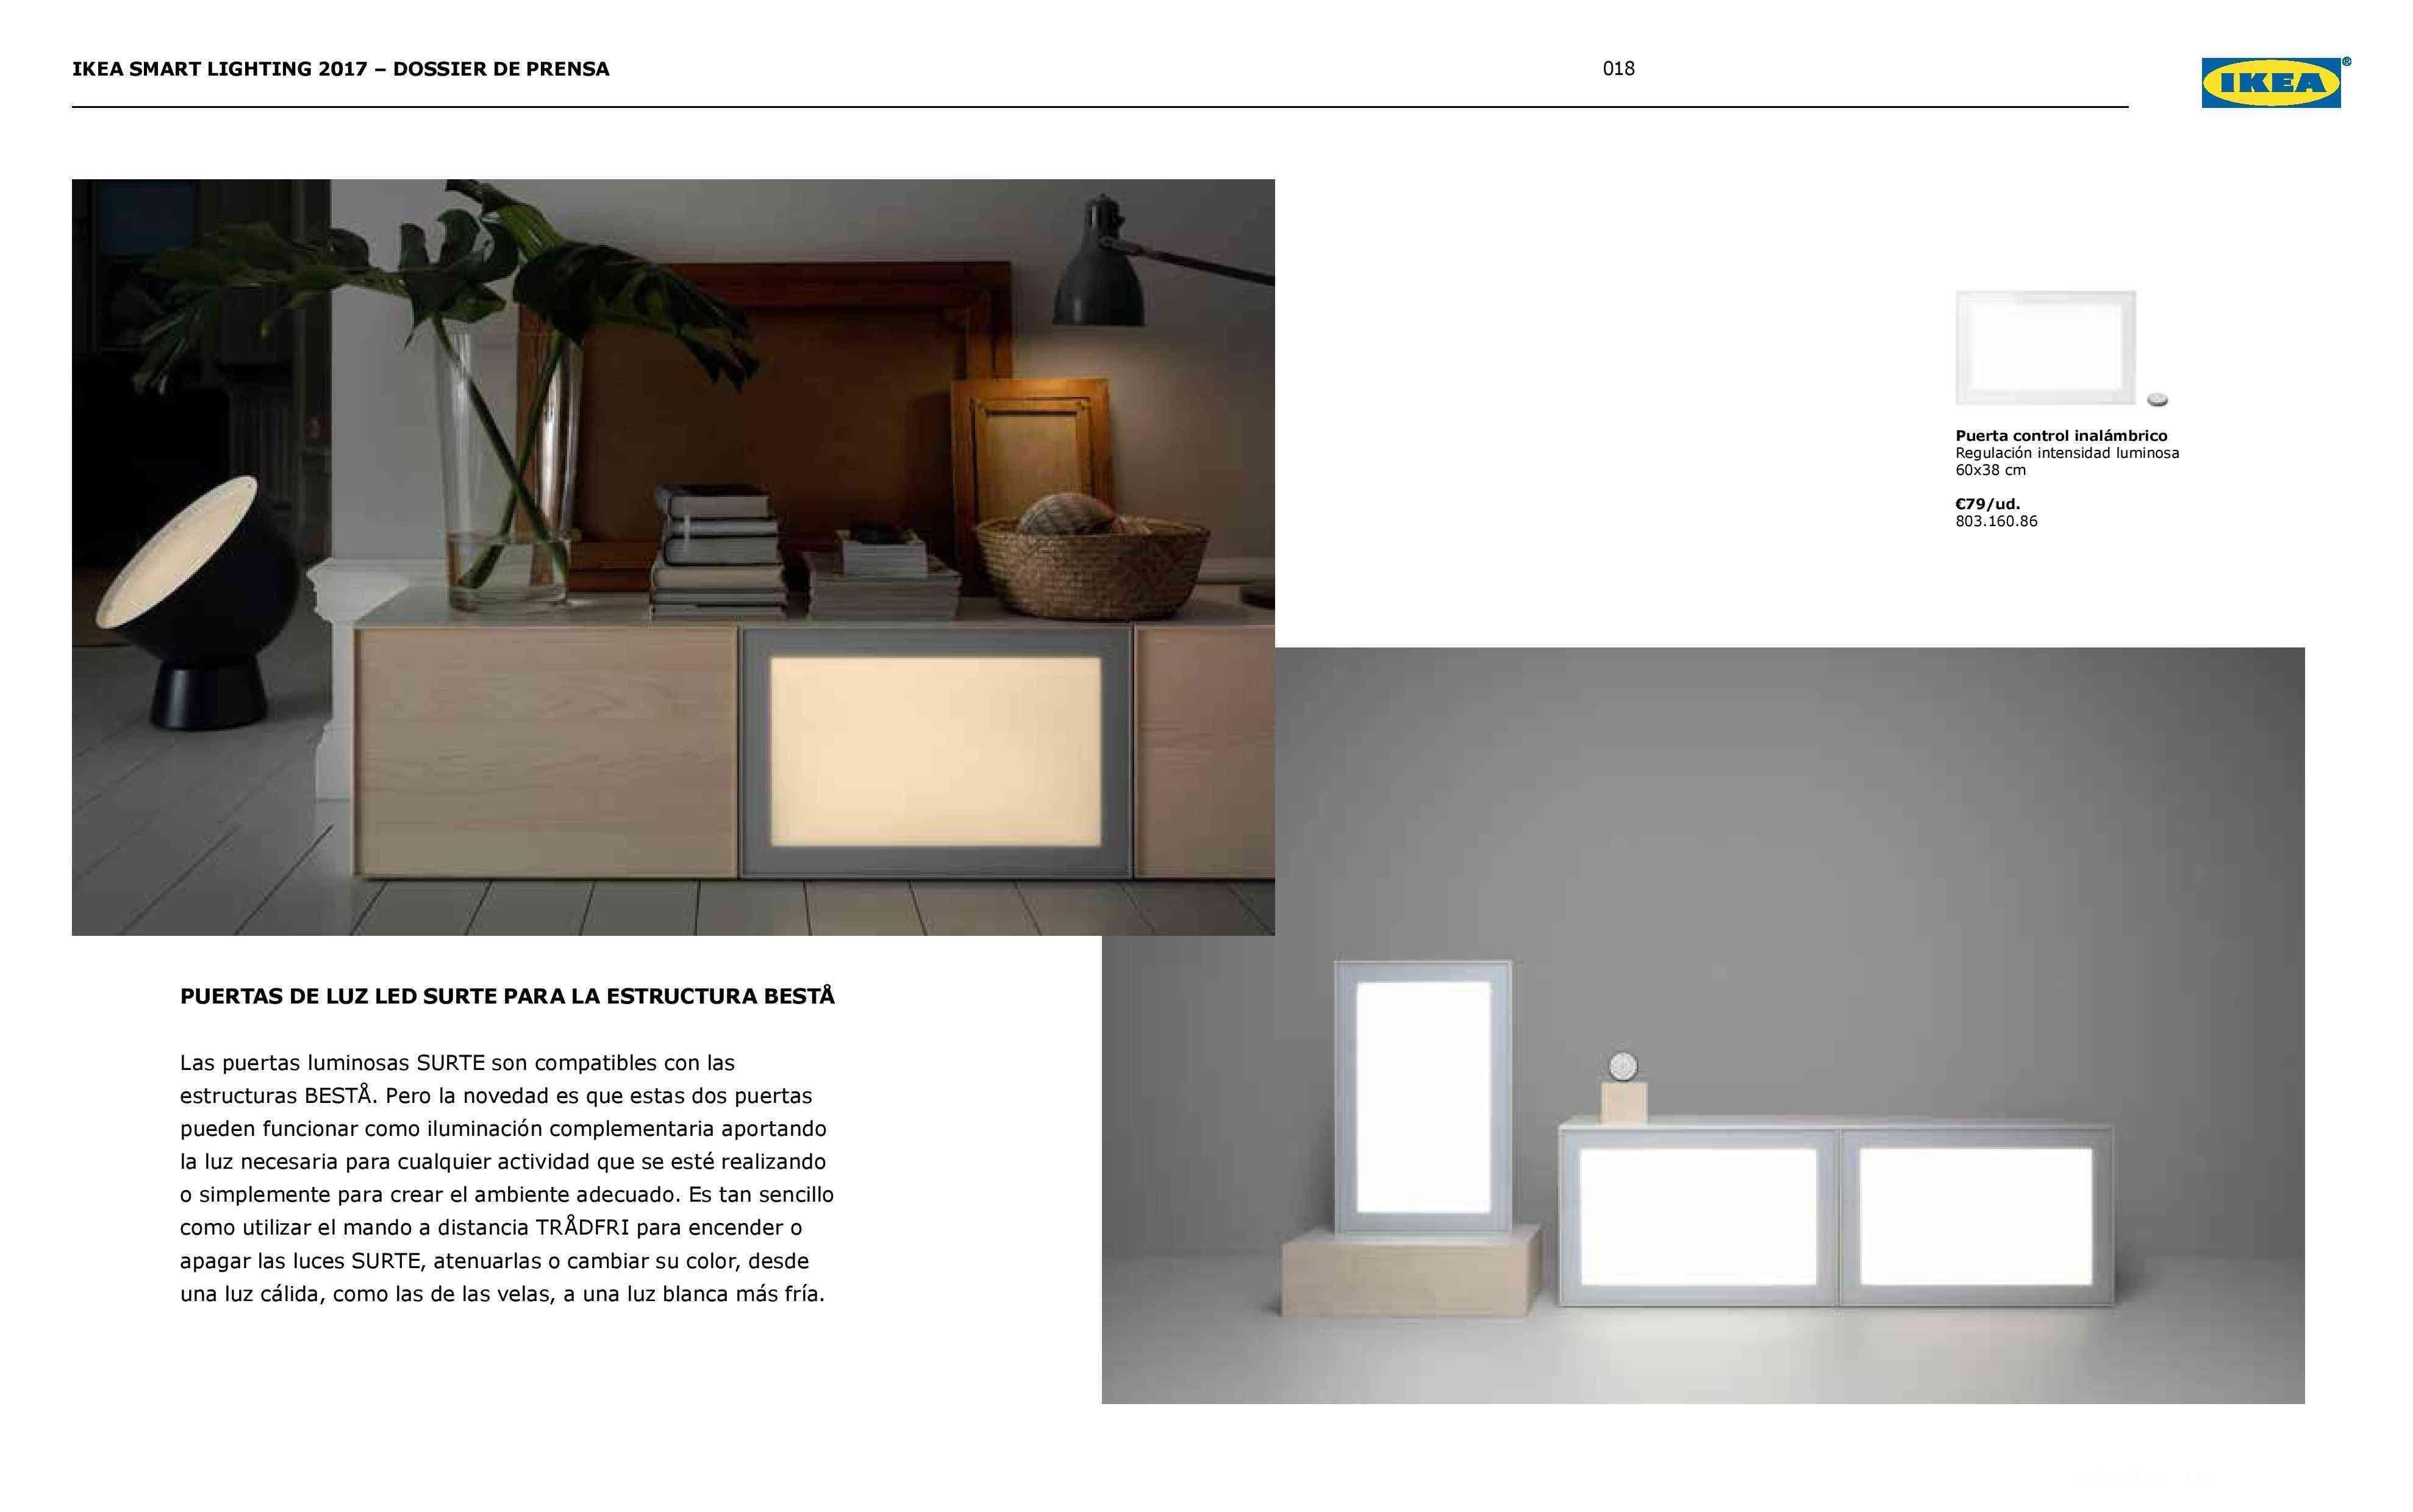 Novedades en iluminación de casas inteligentes con IKEA 74